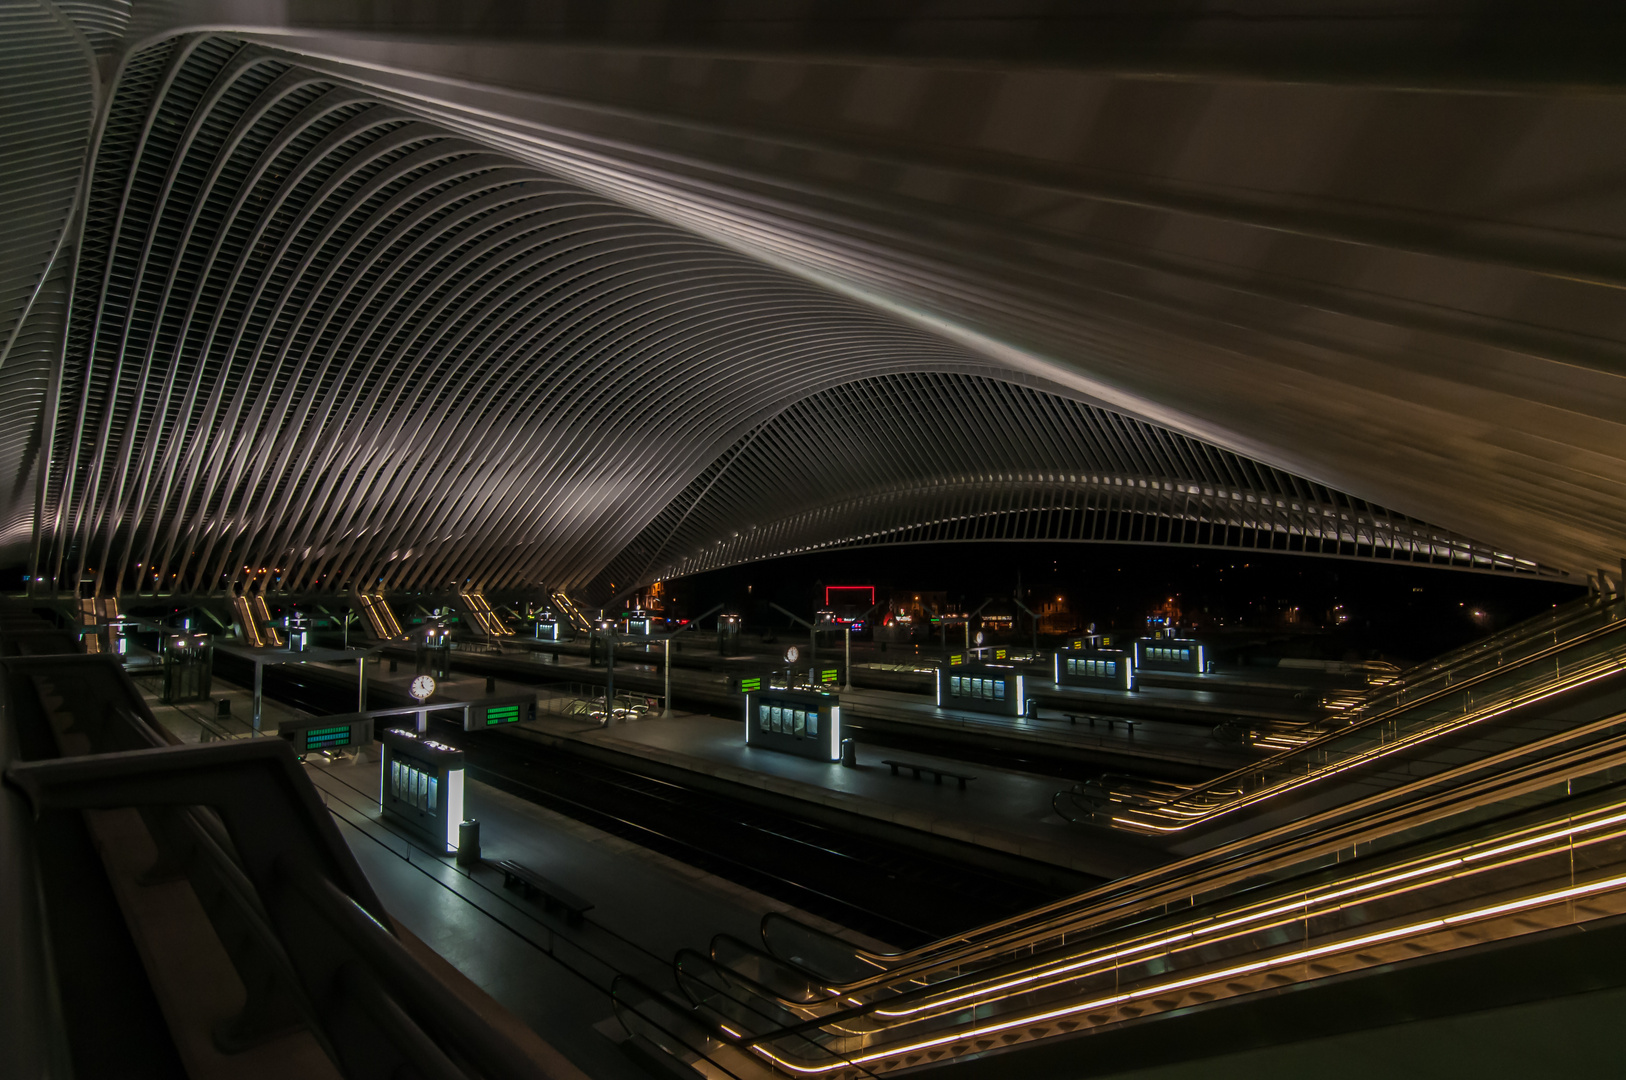 Bahnhof Liège-Guillemins in Lüttich - Architekt: Santiago Calatrava